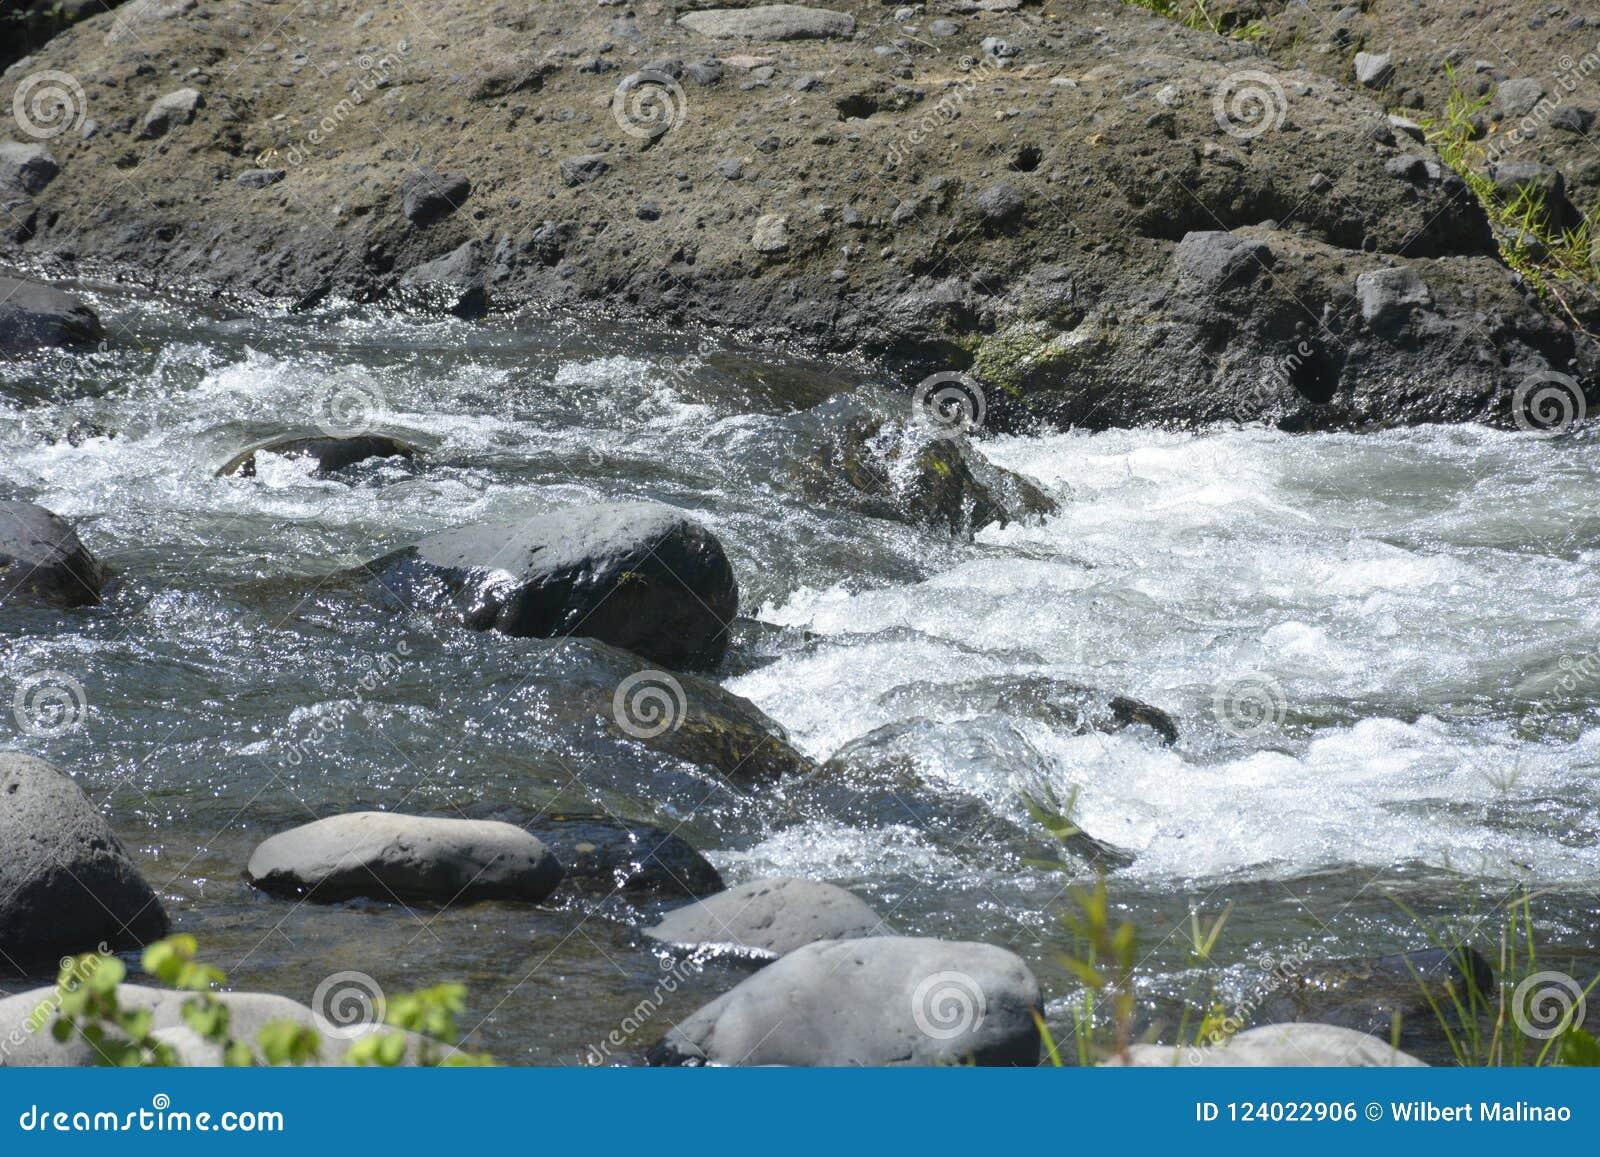 Ruparan河位于barangay Ruparan, Digos市,南达沃省,菲律宾